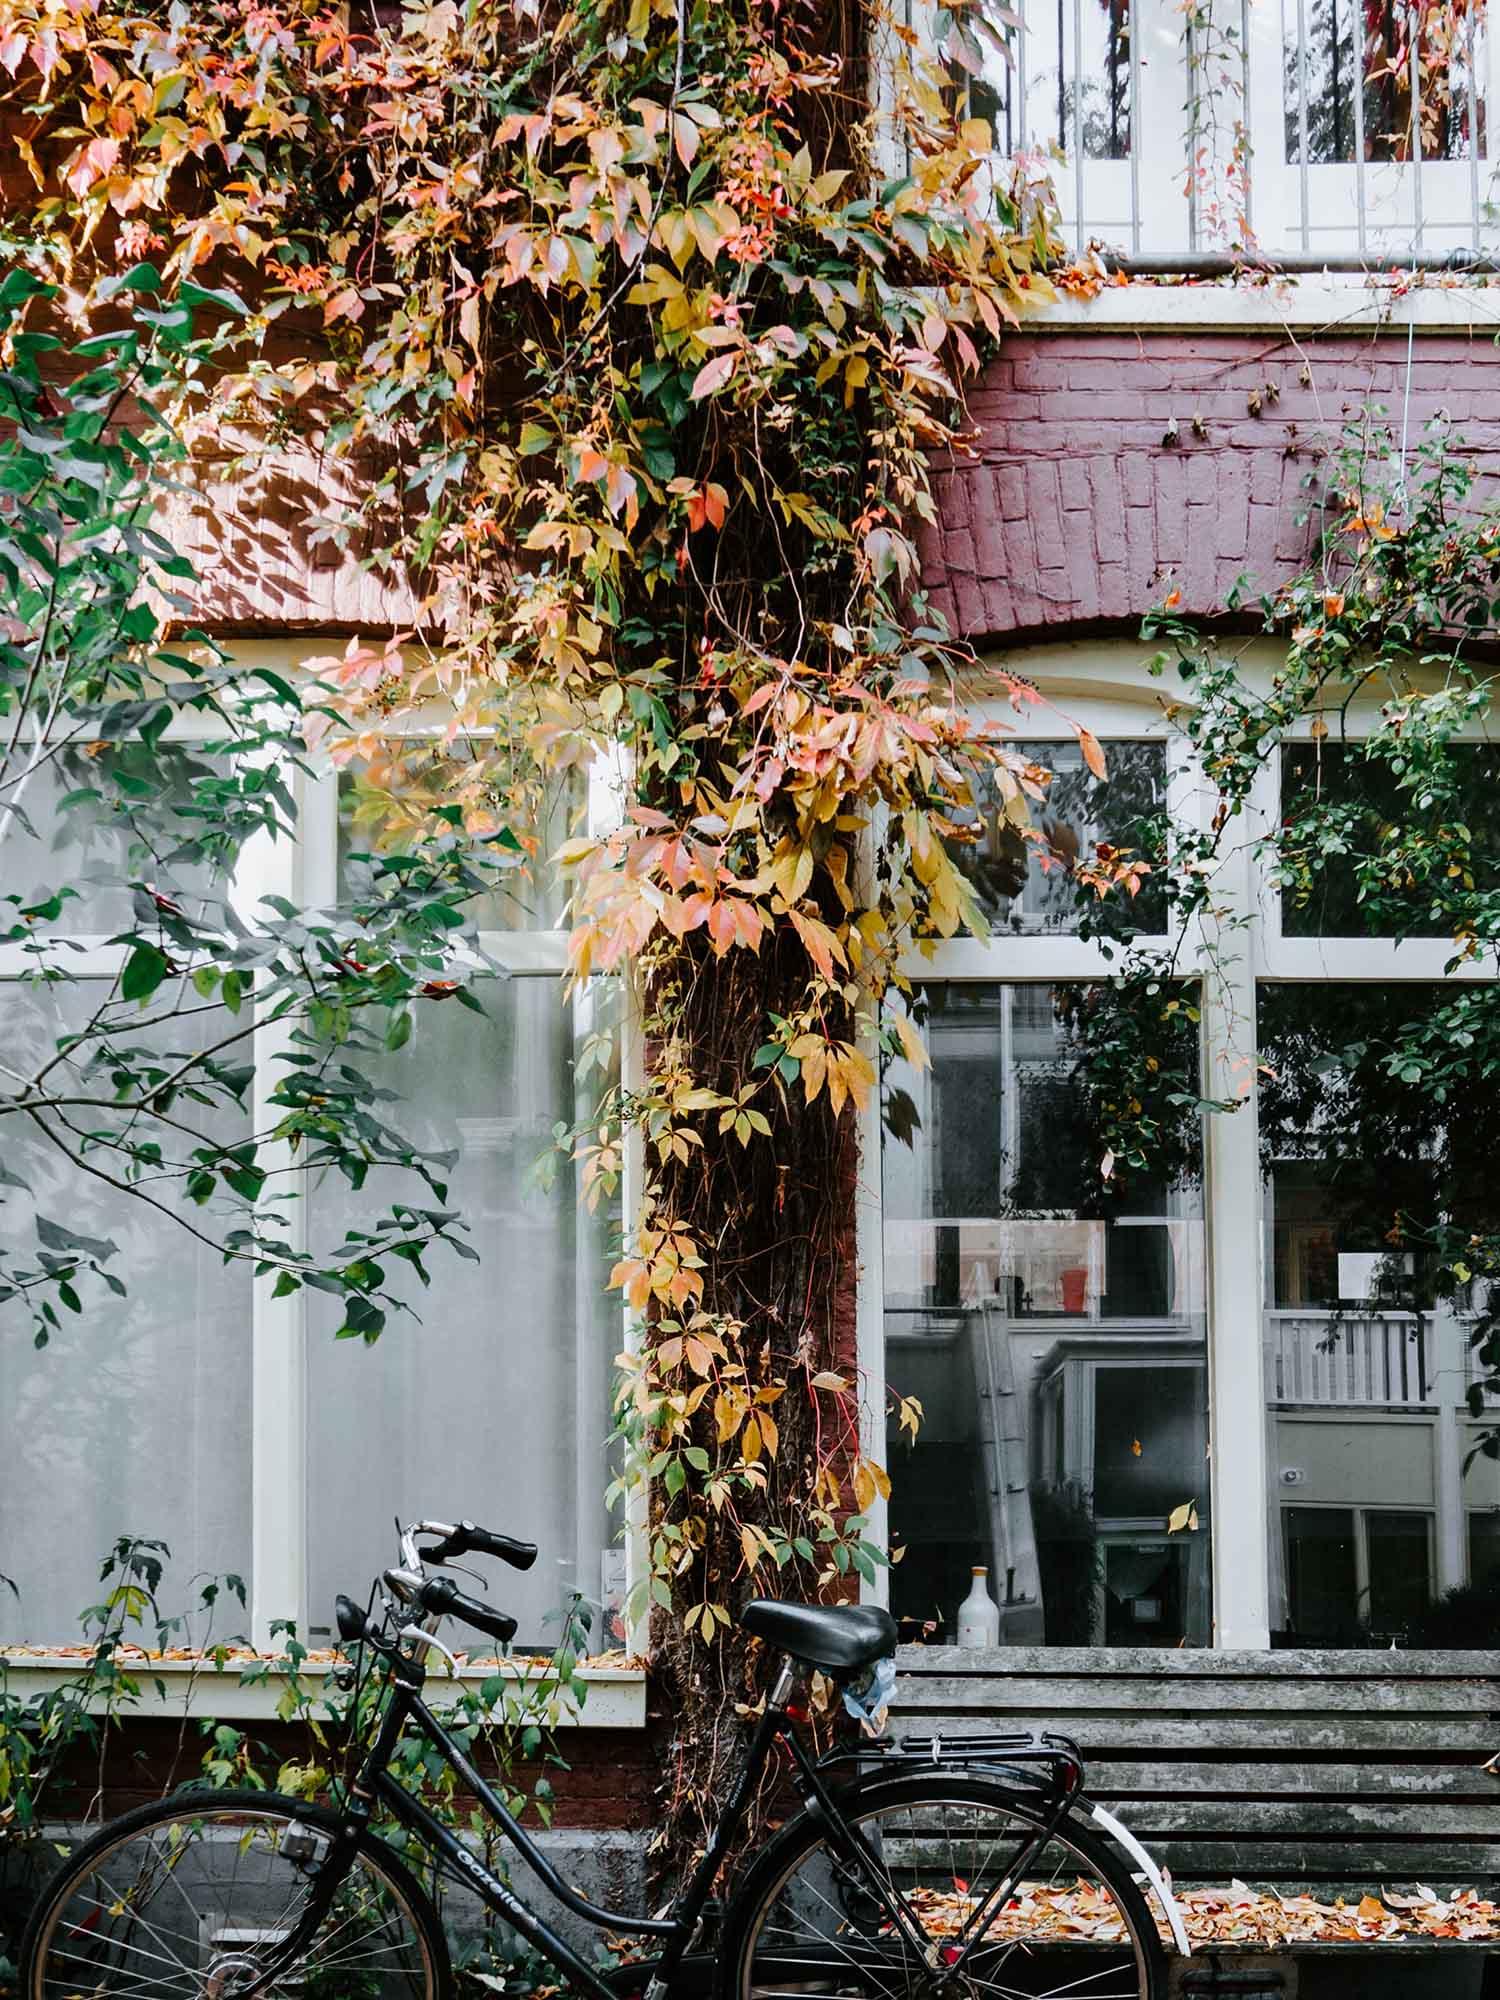 rent a bike amsterdam